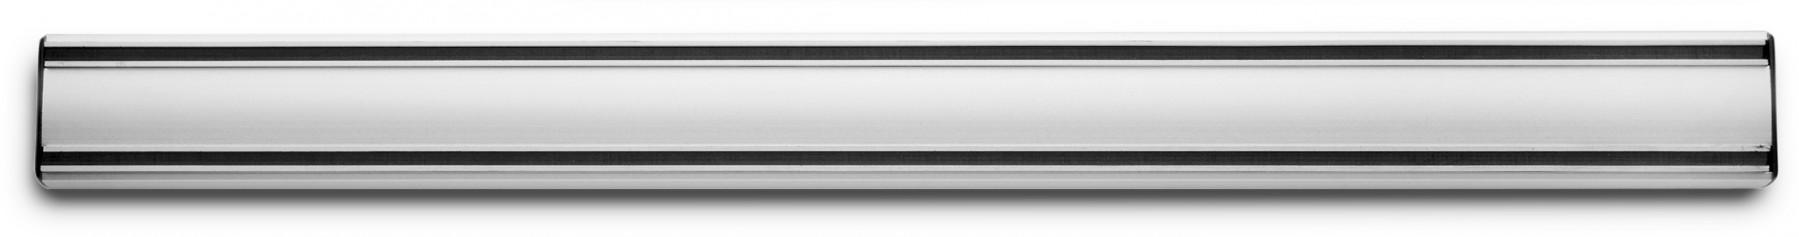 Wüsthof Dreizack Magnethalter Aluminium 50cm